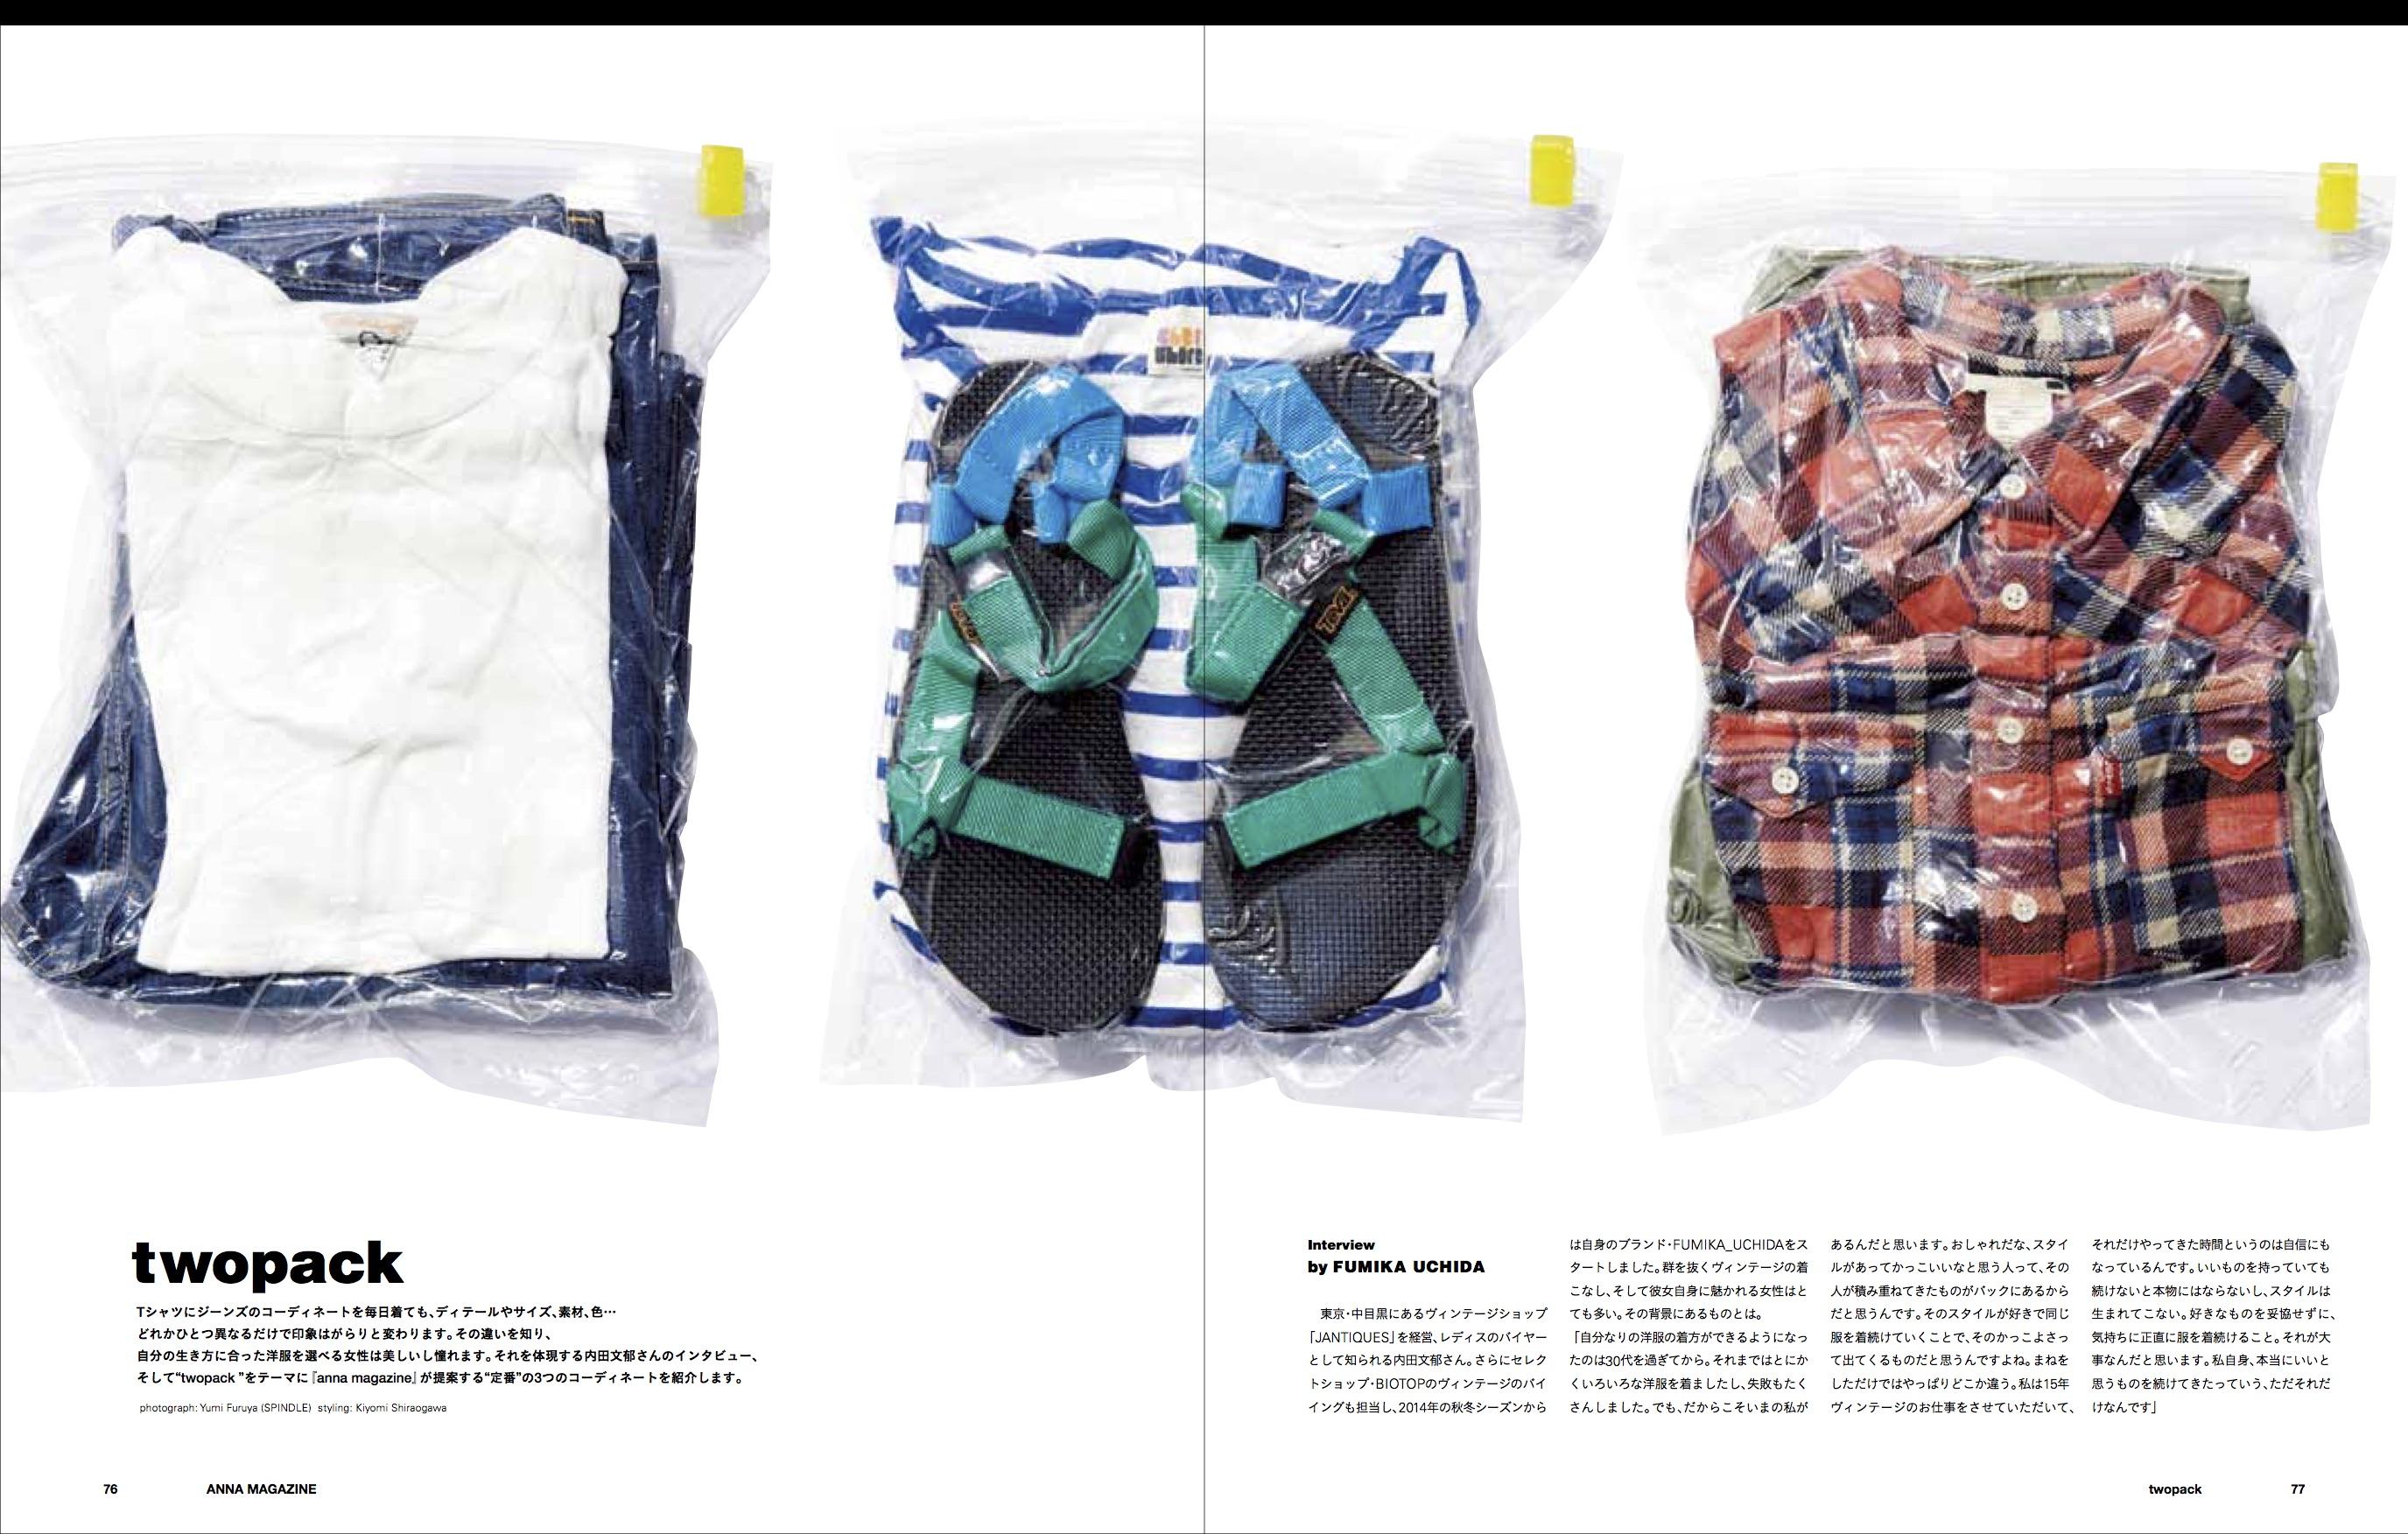 anna magazine Vol.3 P21